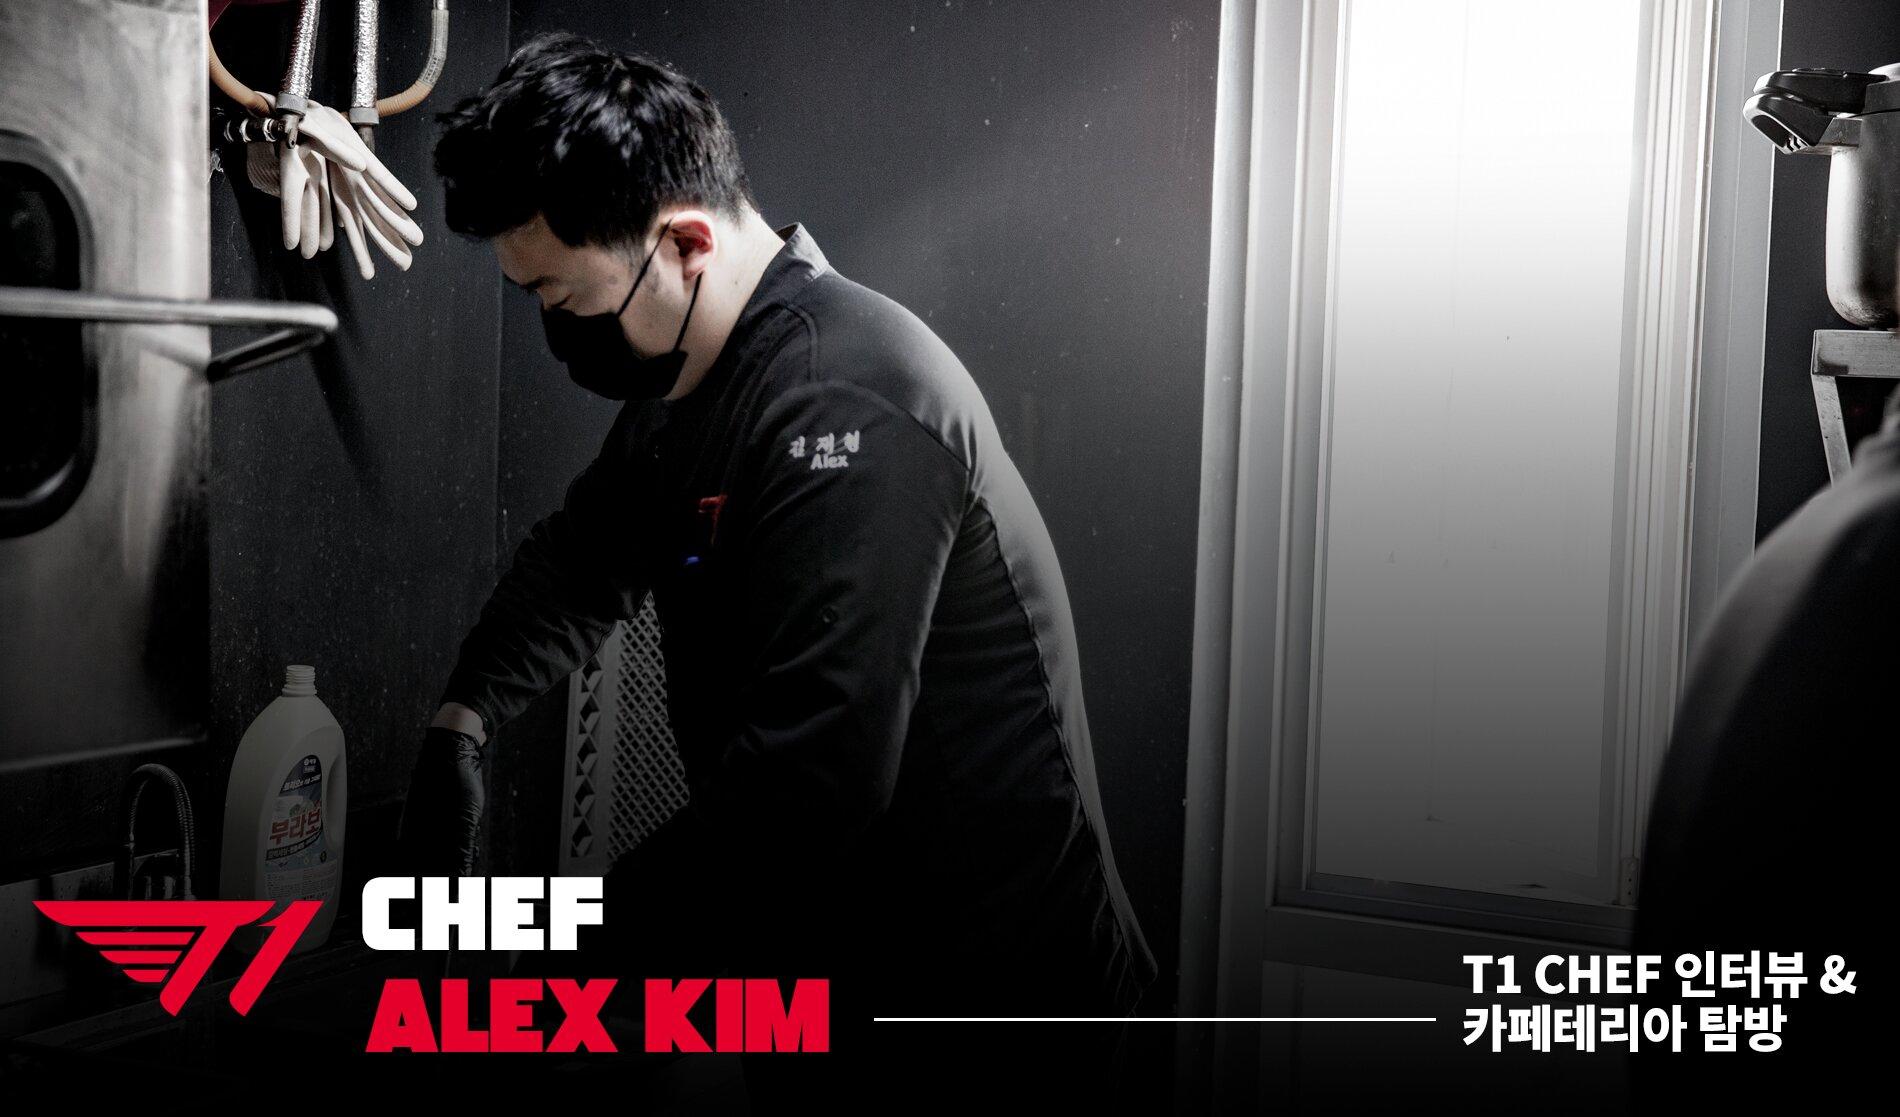 T1 chefe Kim